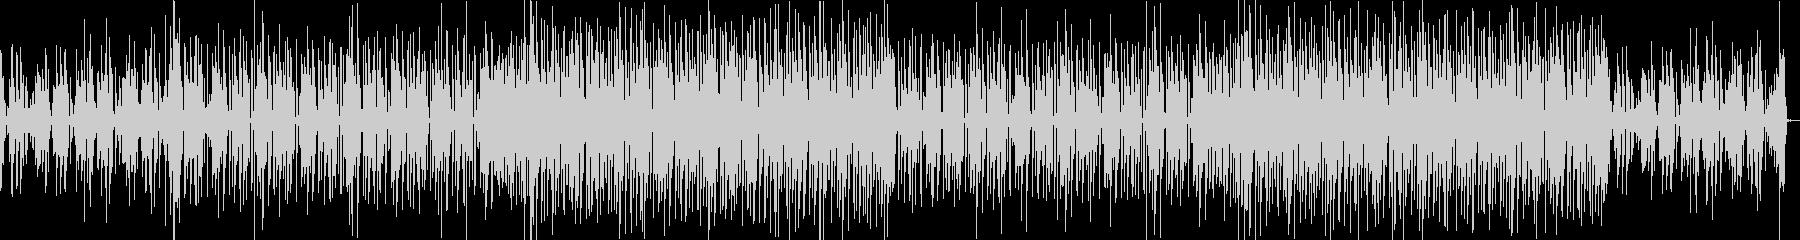 Twice風なKpopサウンドの未再生の波形